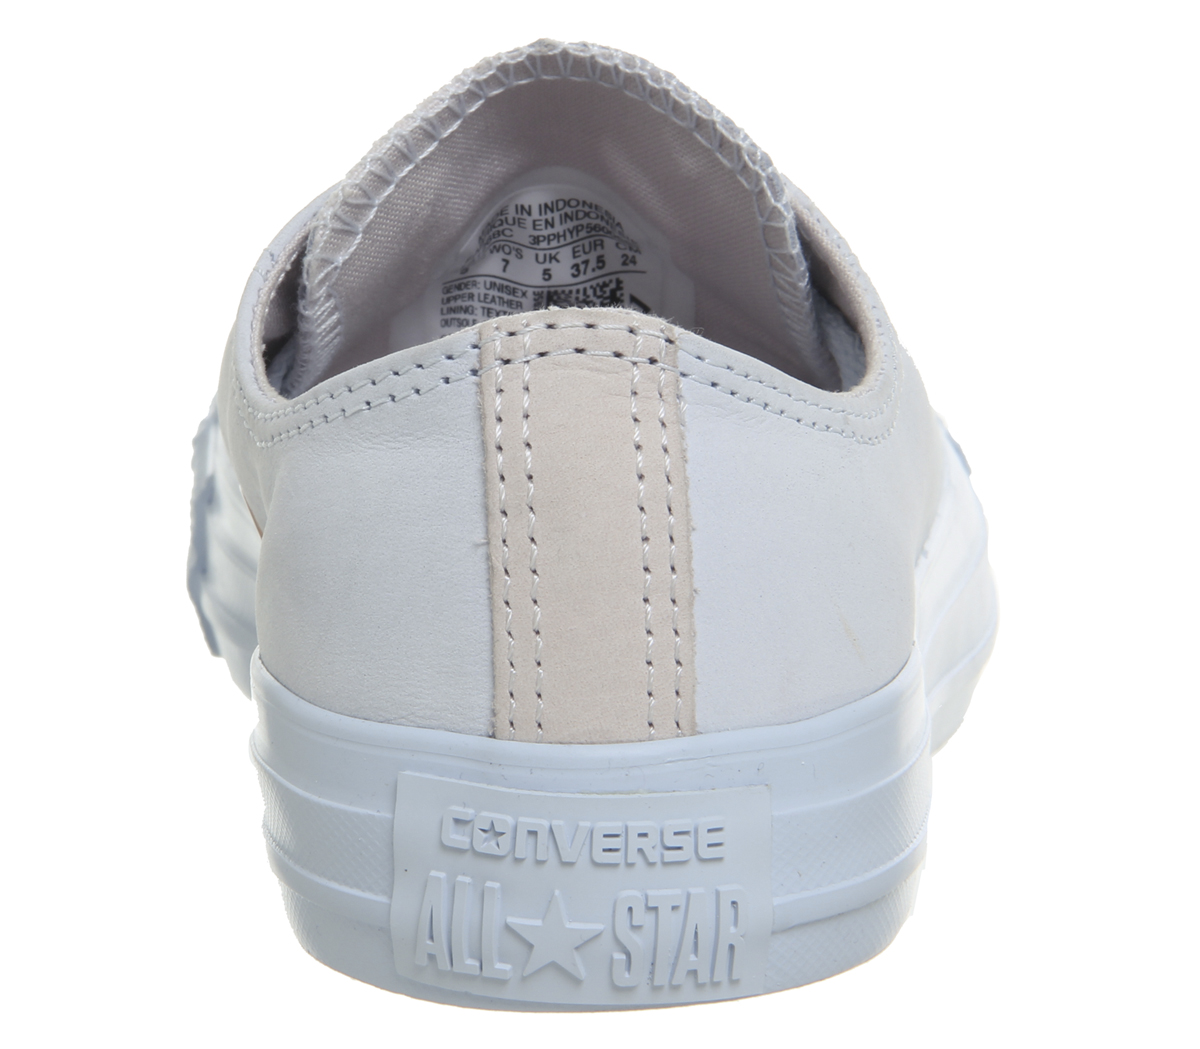 c4e1fb035185 Womens Converse All Star Low Leather Trainers Blue Tint Pale Quartz ...